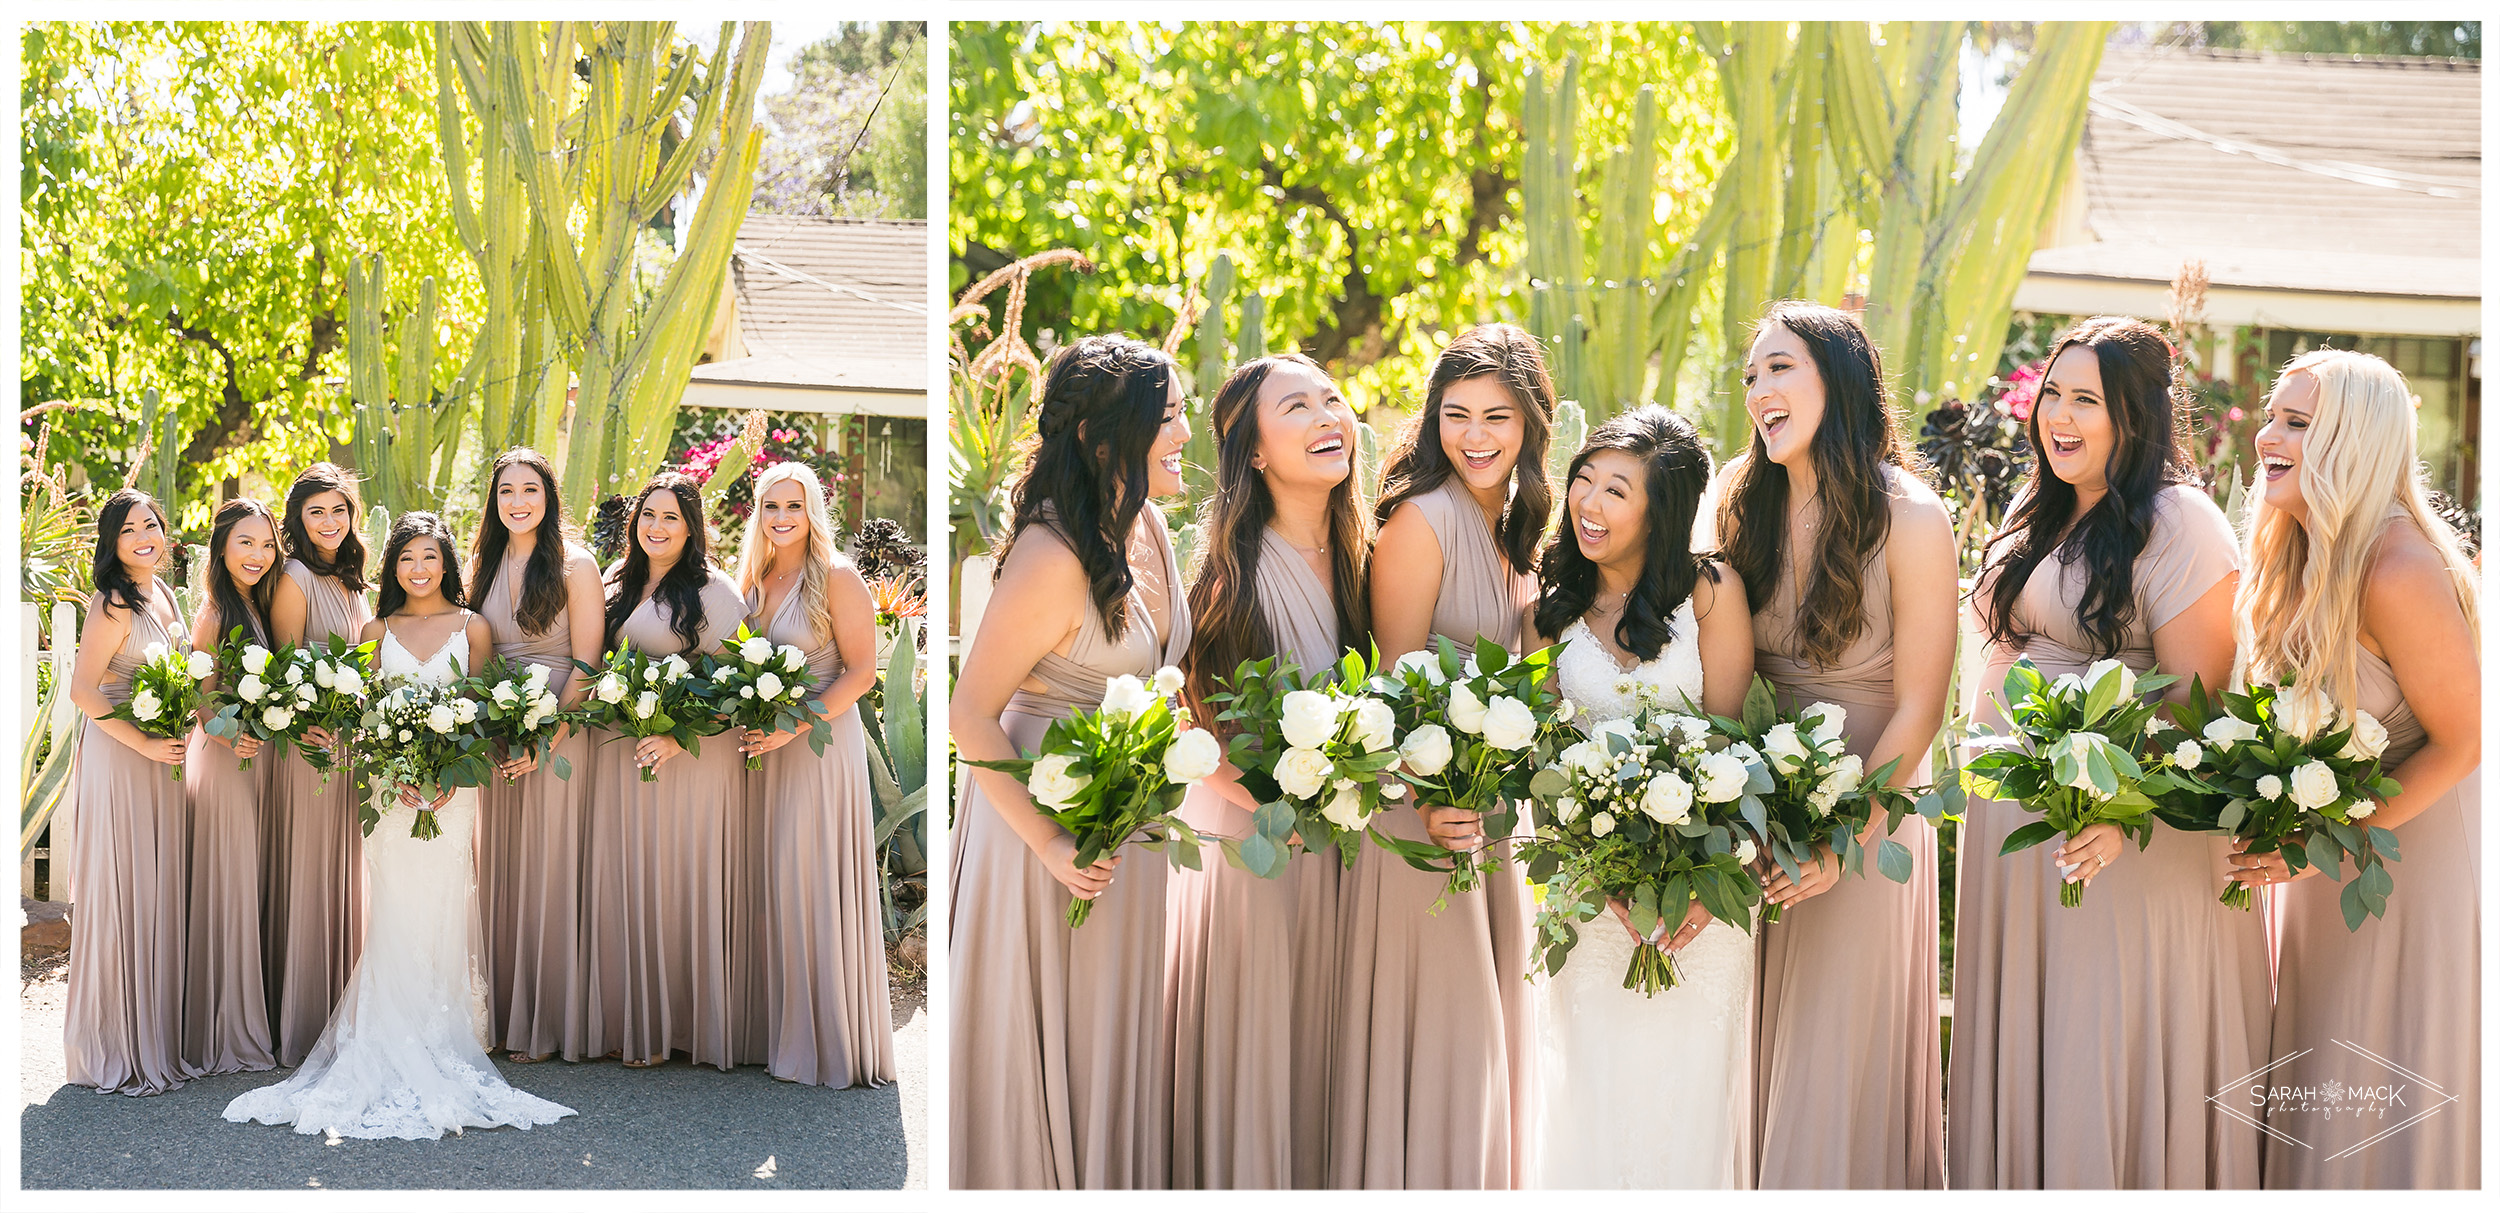 EC_Plaza-De-Magdalena-San-Juan-Capistrano-Wedding-Photography-35.jpg